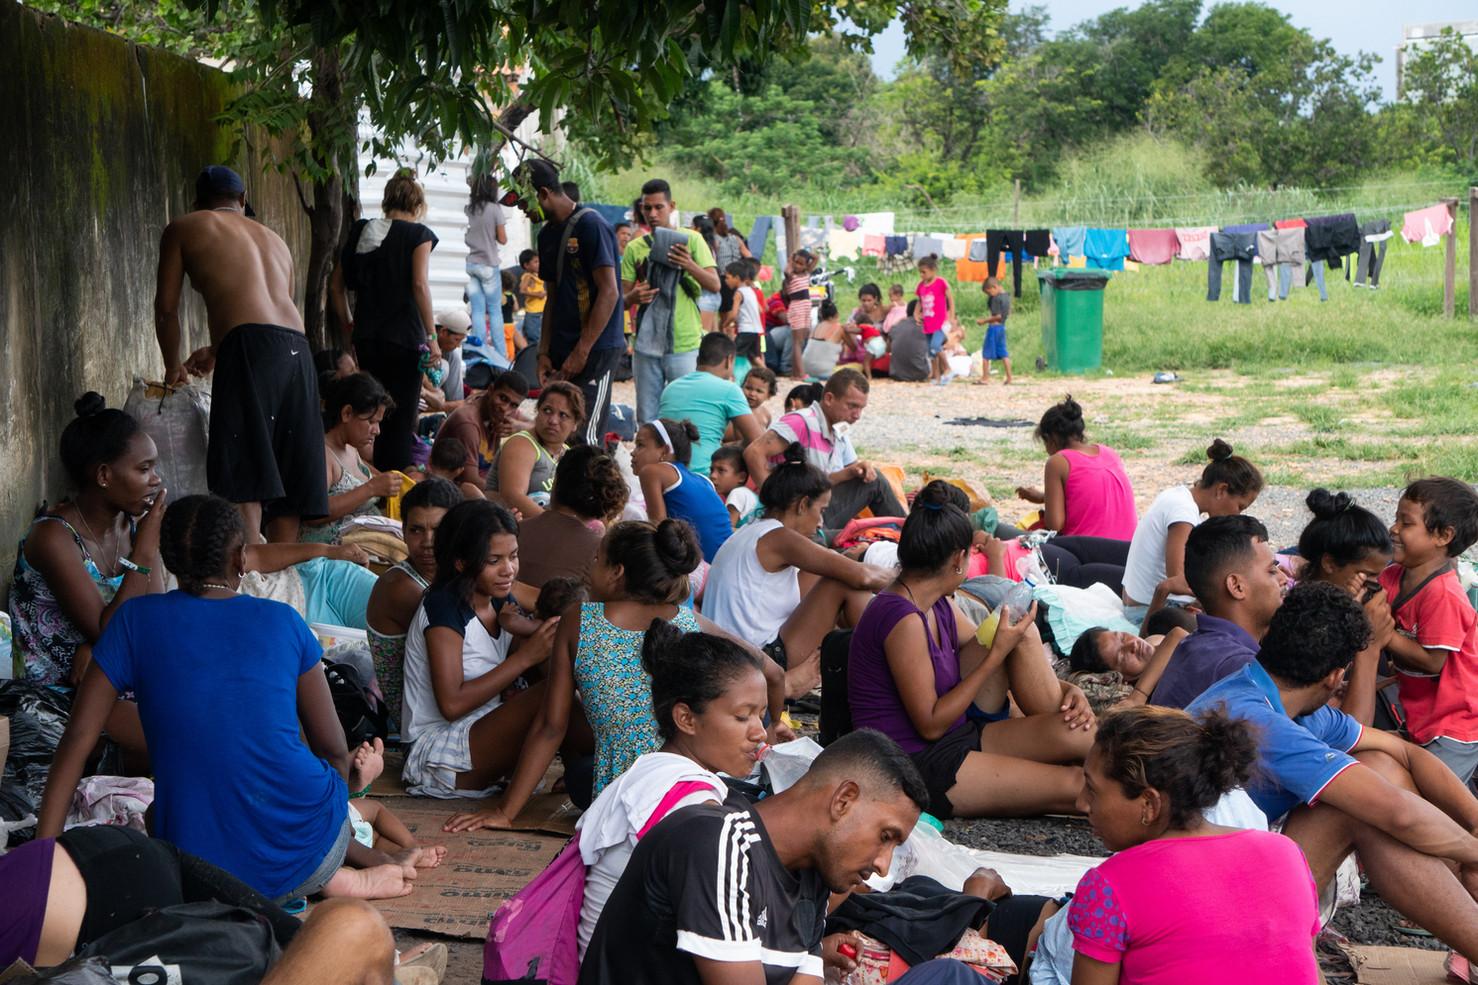 Dozens of homeless Venezuelan immigrants await food in a vacant lot in Boa Vista capital, Roraima state, Brazil, July 2019.